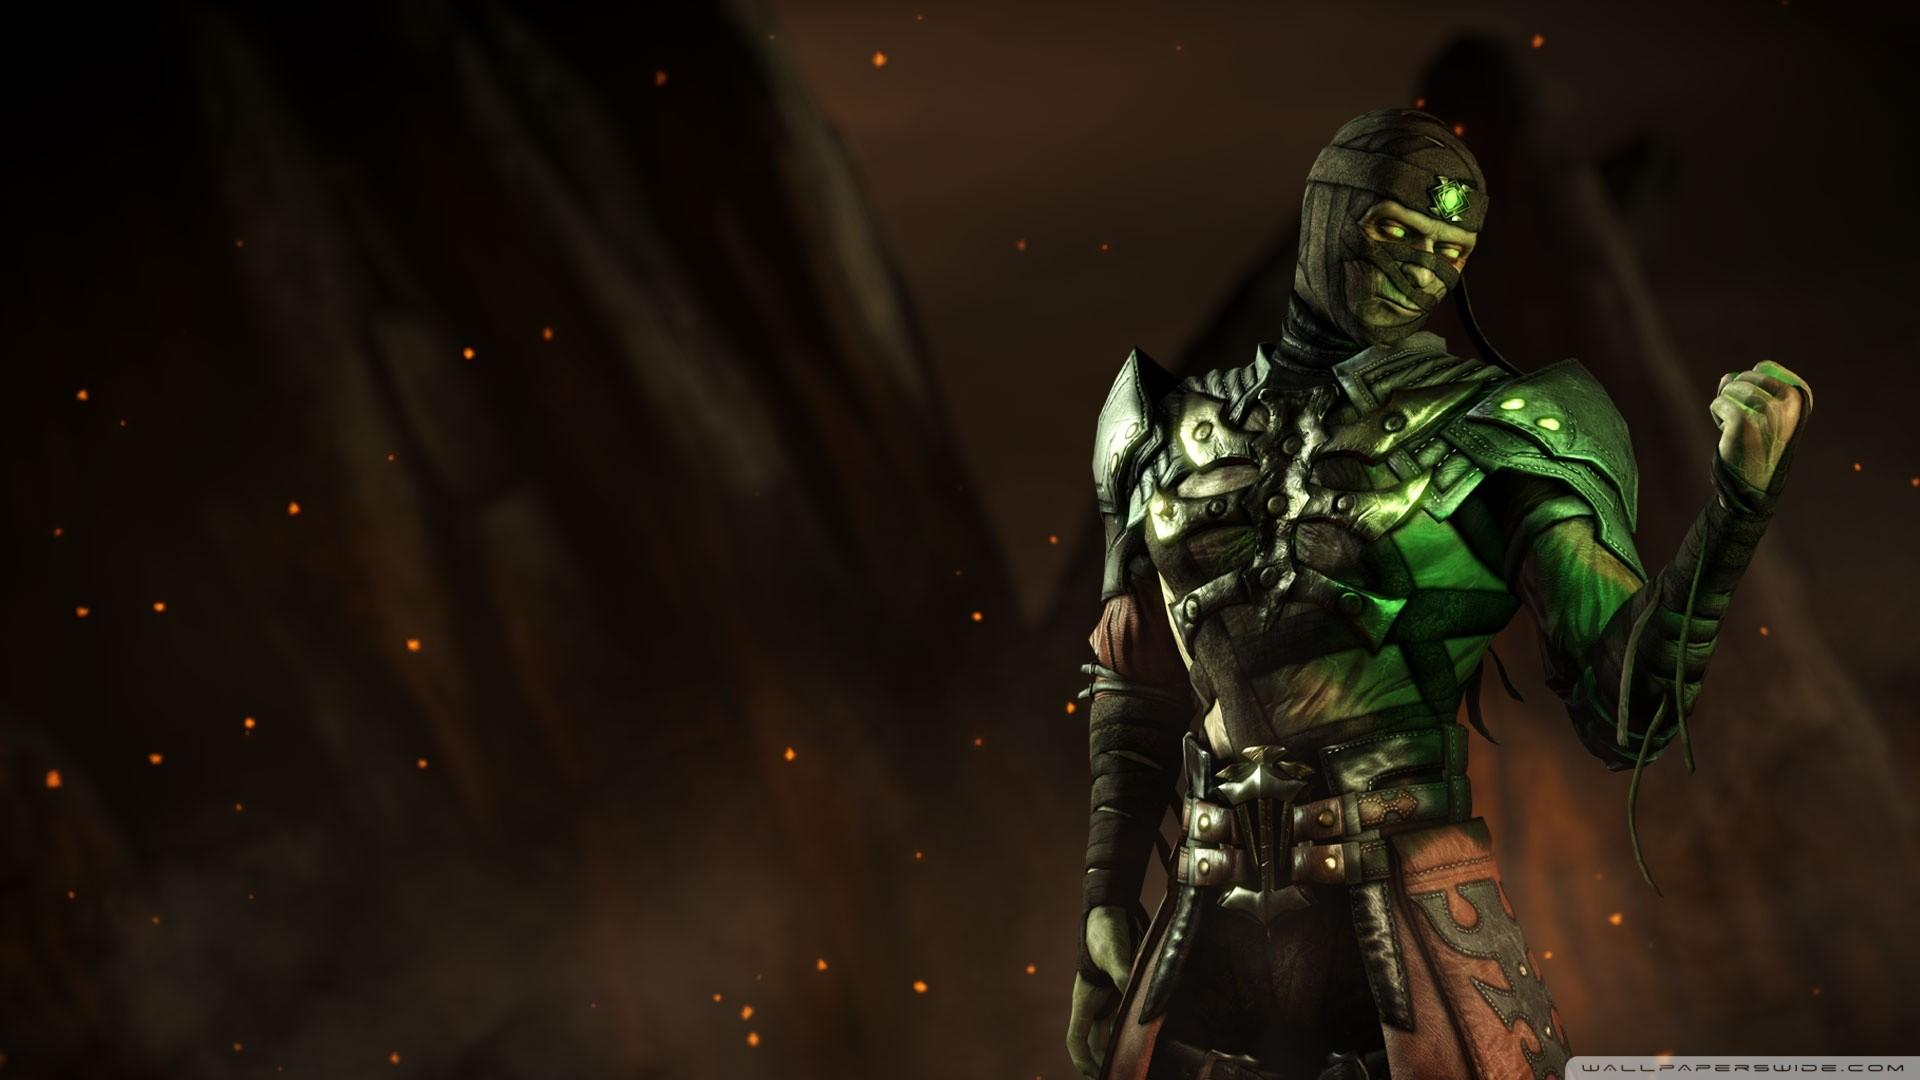 Mortal Kombat X Ermac HD desktop wallpaper : Widescreen : High